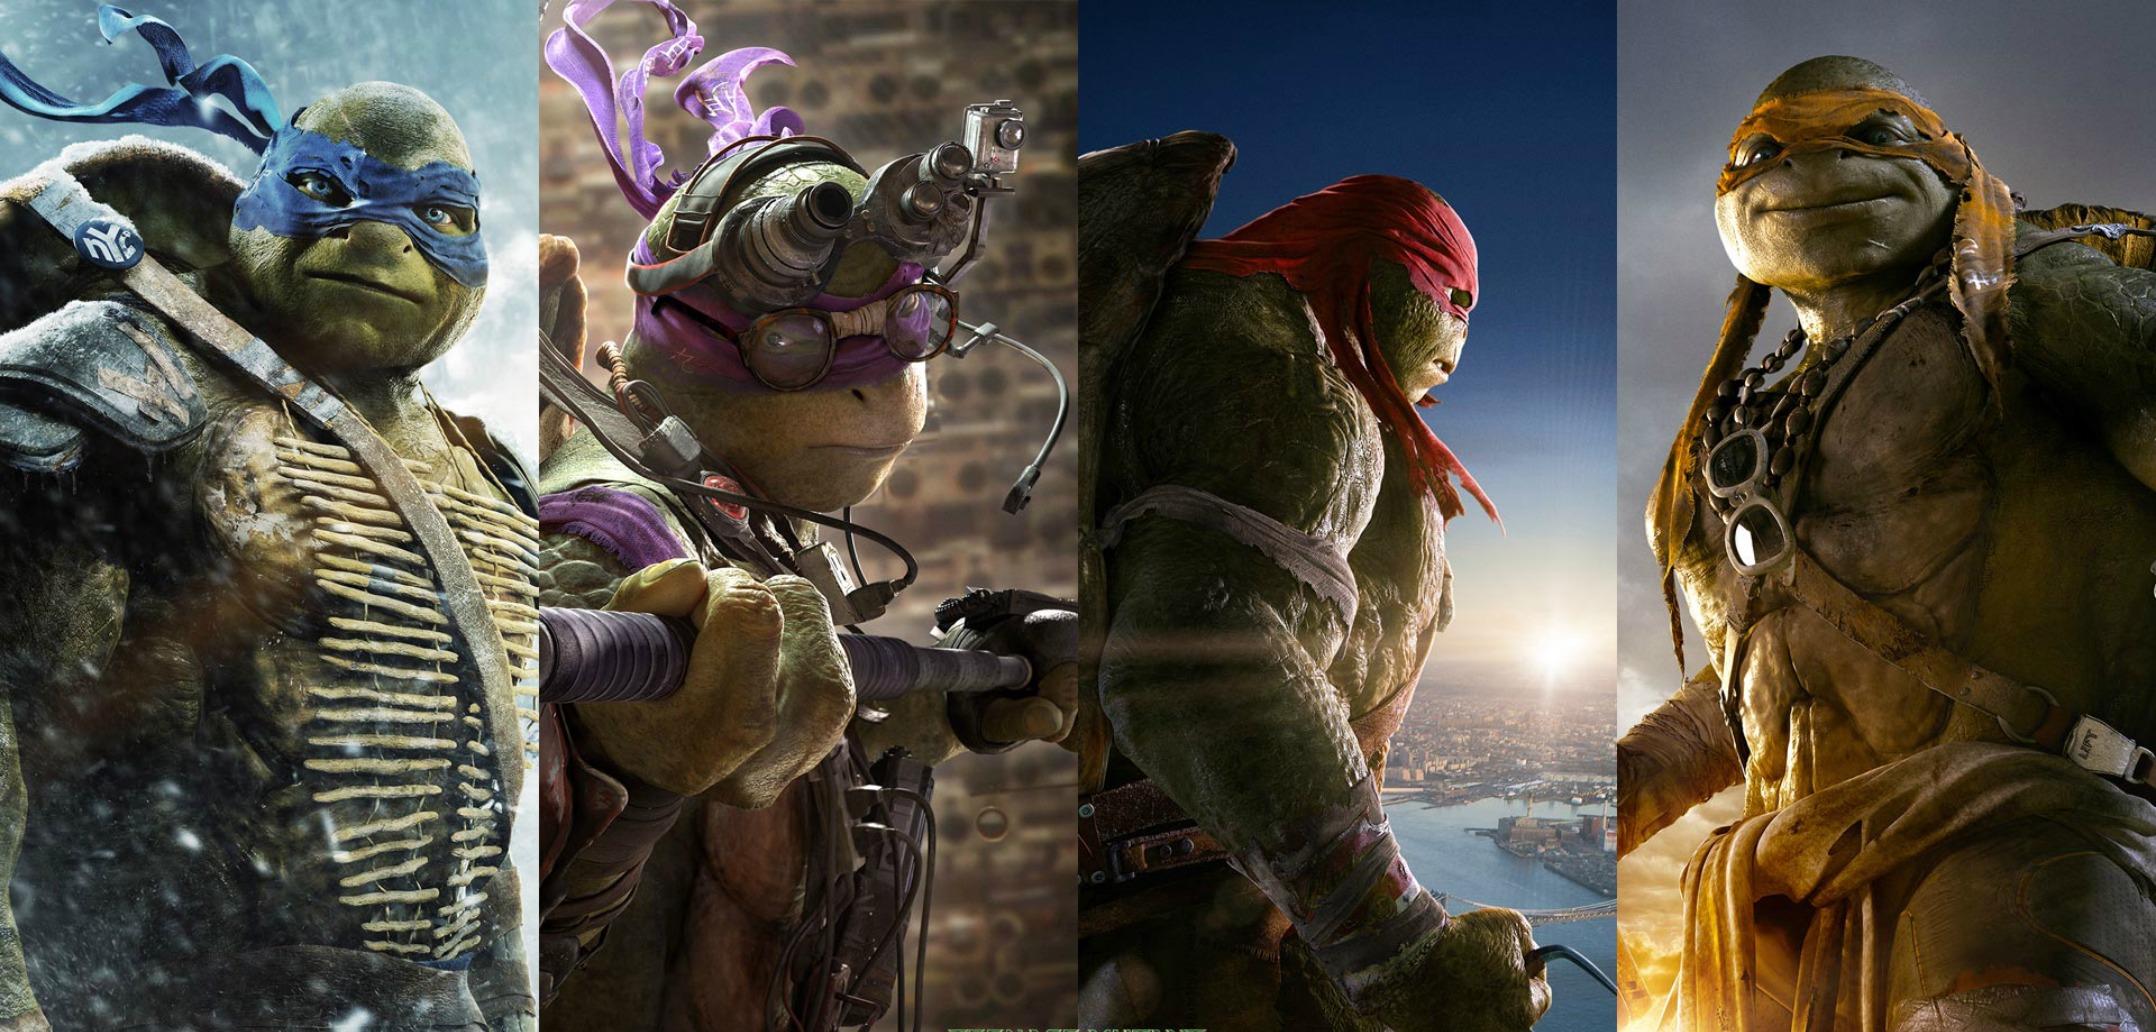 Athletes Who Should Star In A Teenage Mutant Ninja Turtles Movie